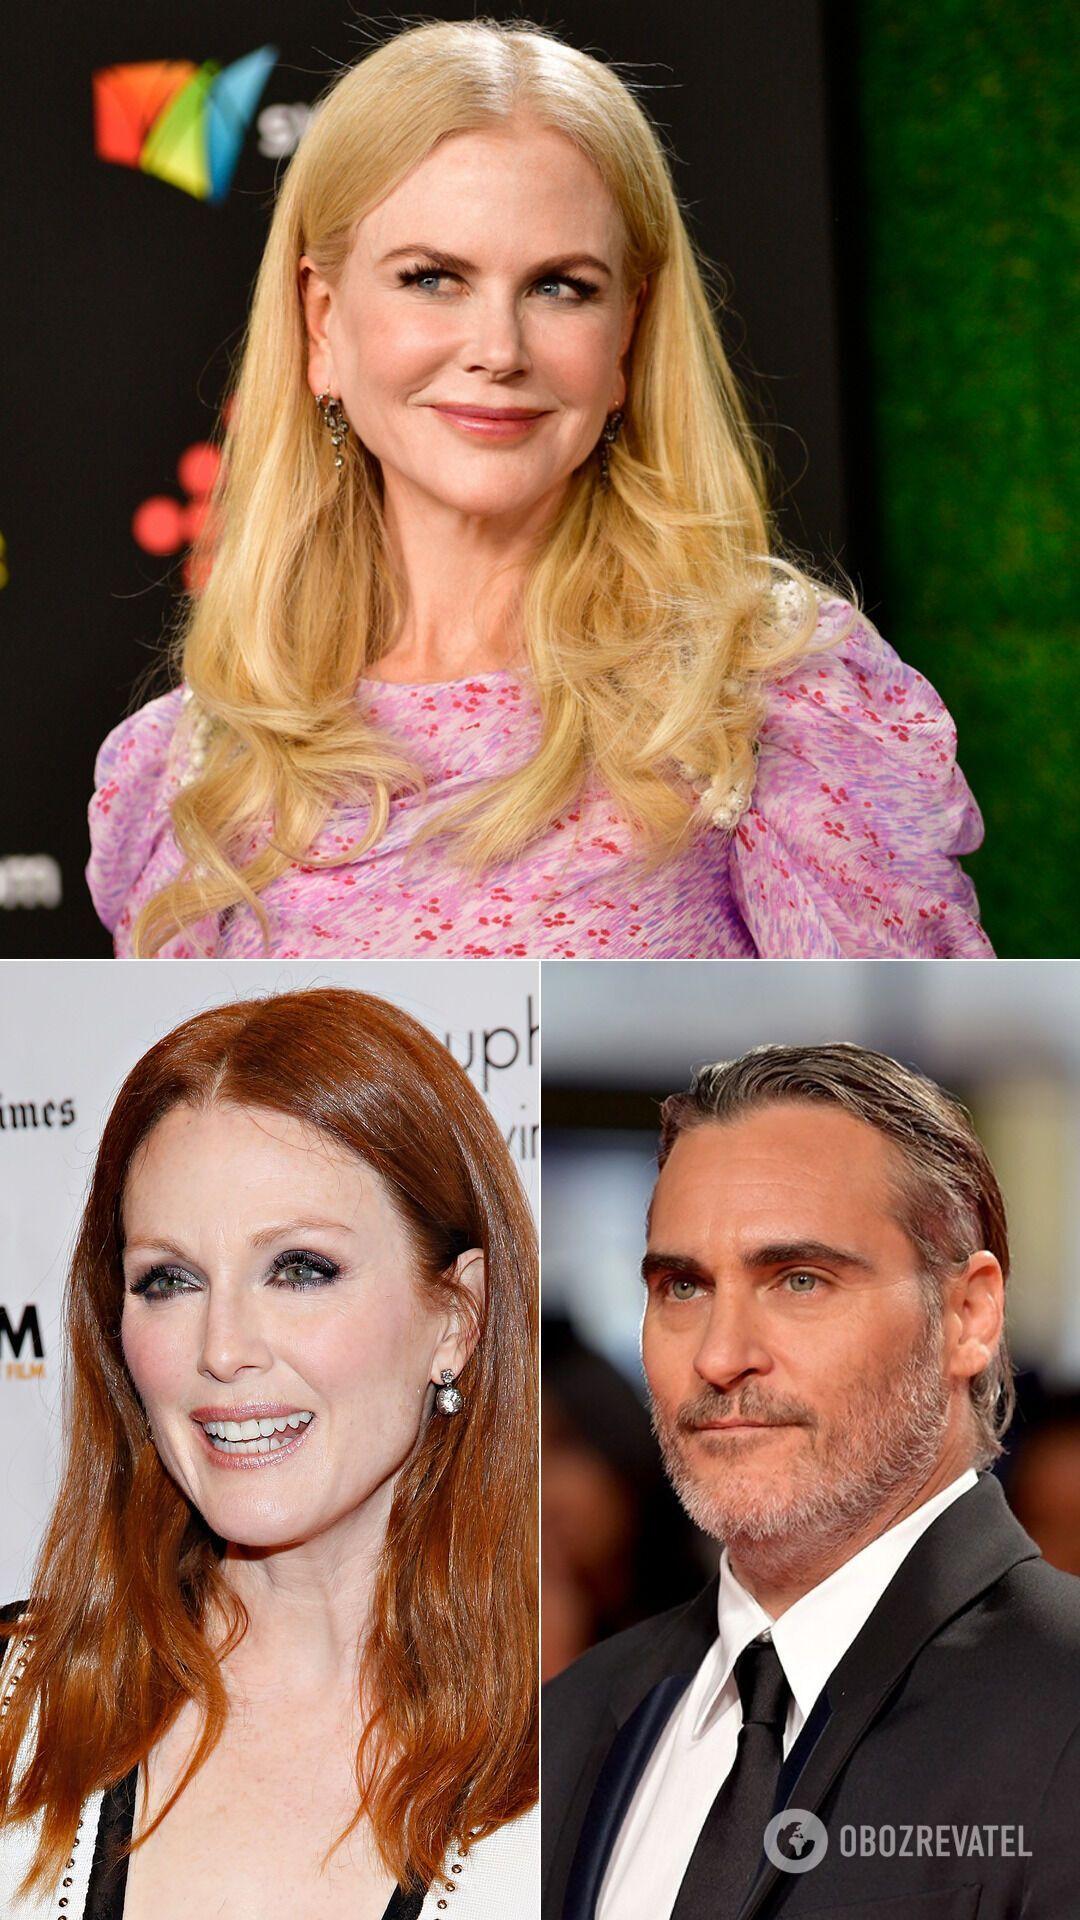 The New York Times опубликовало список лучших актеров